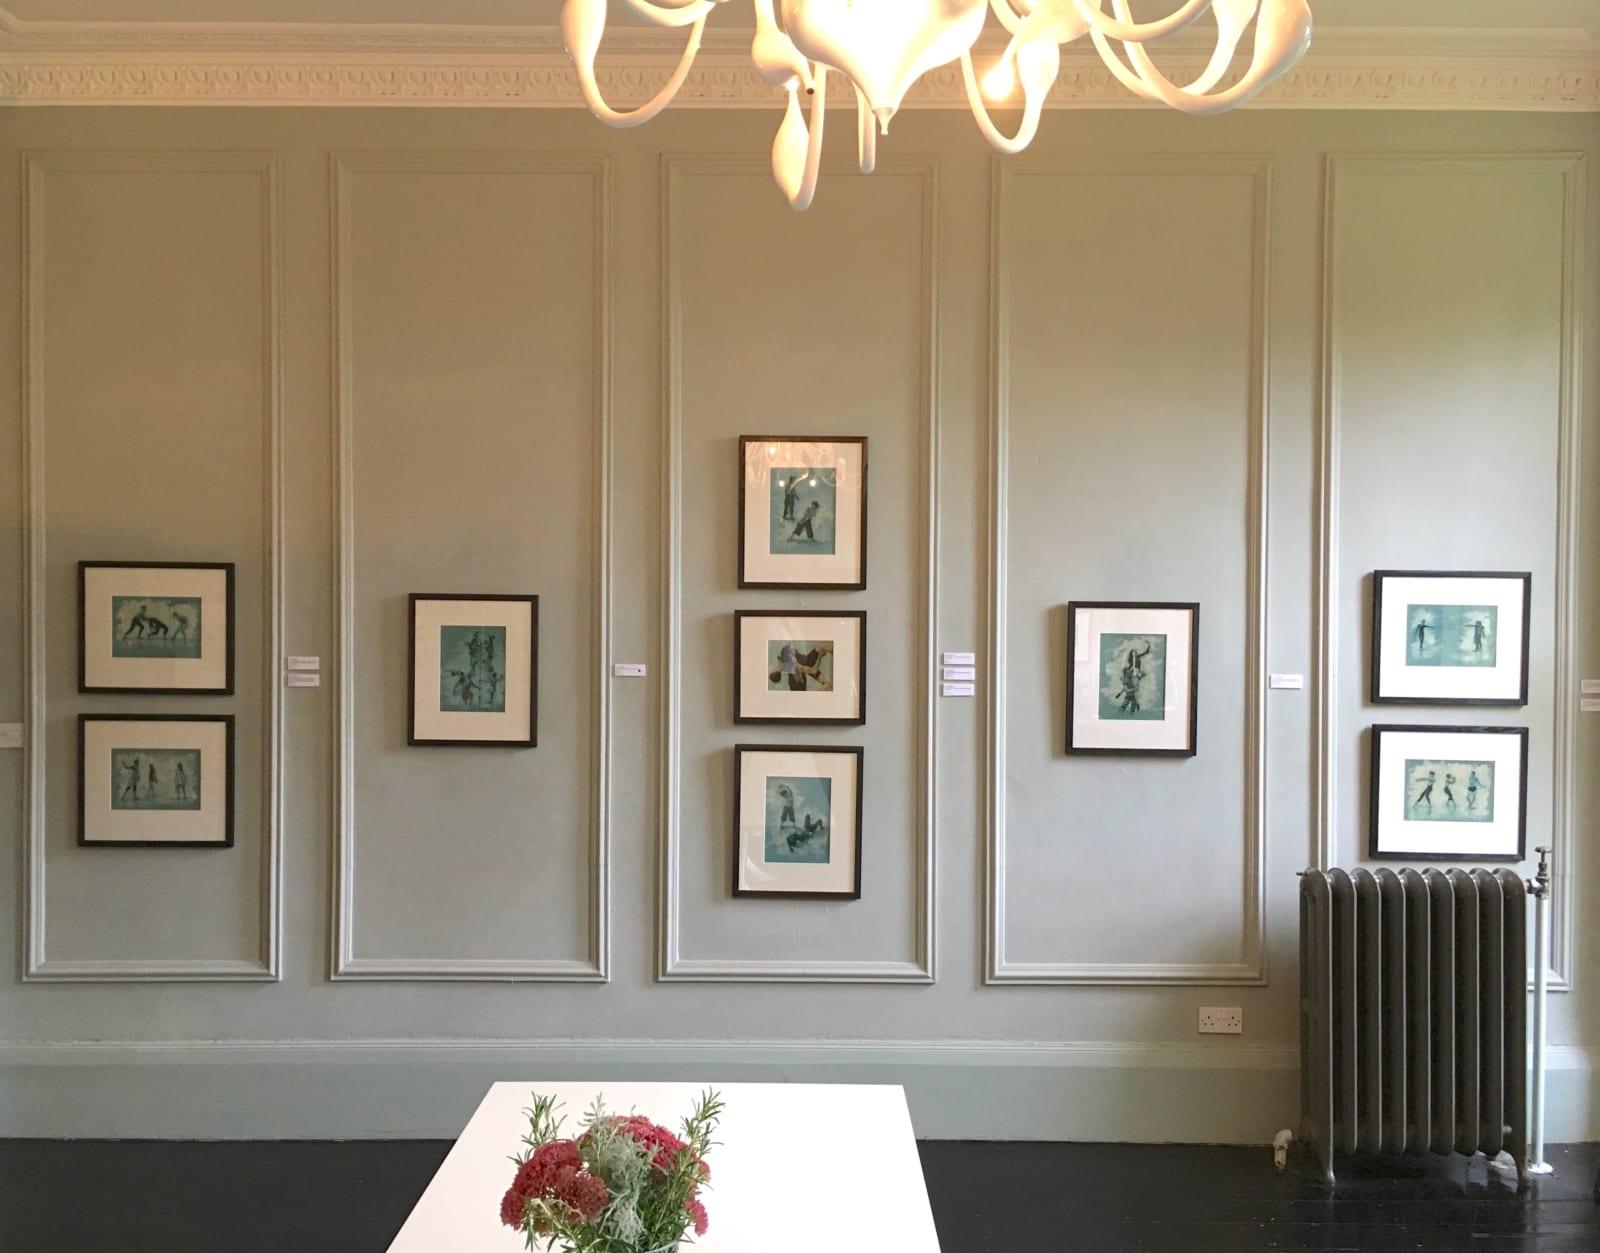 Ffin y Parc Gallery, 2019